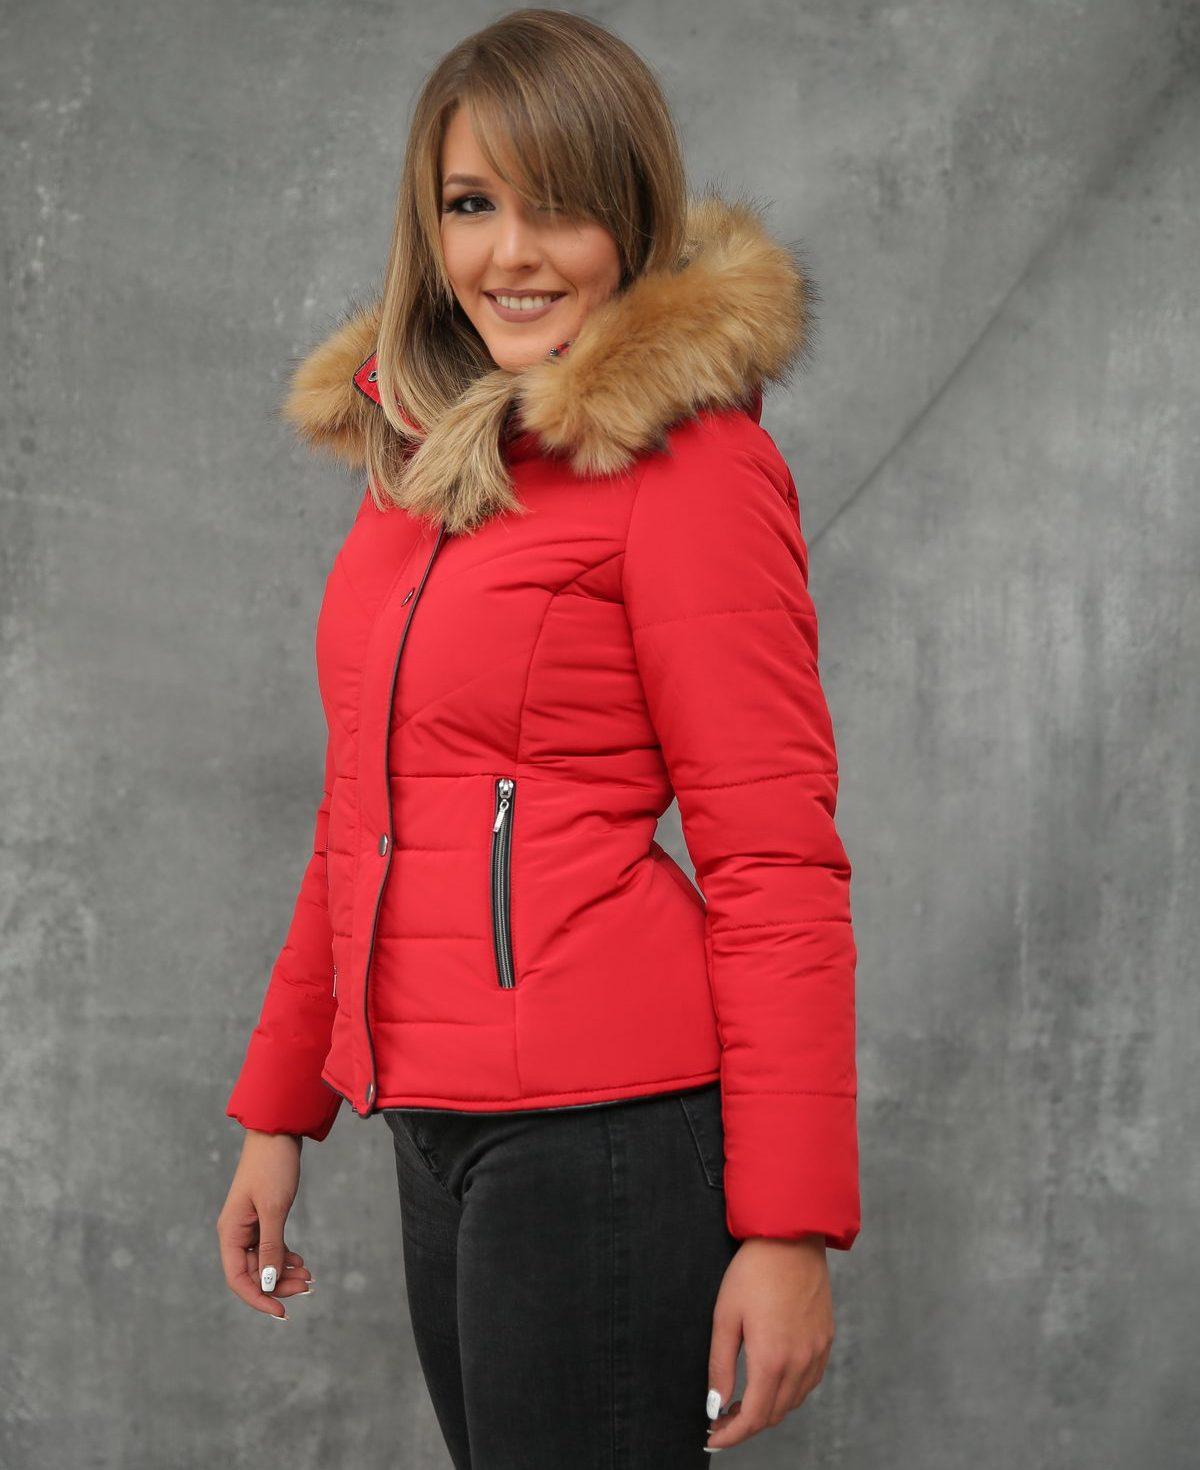 Ženska jakna ForteFashion model F5 (crvena)